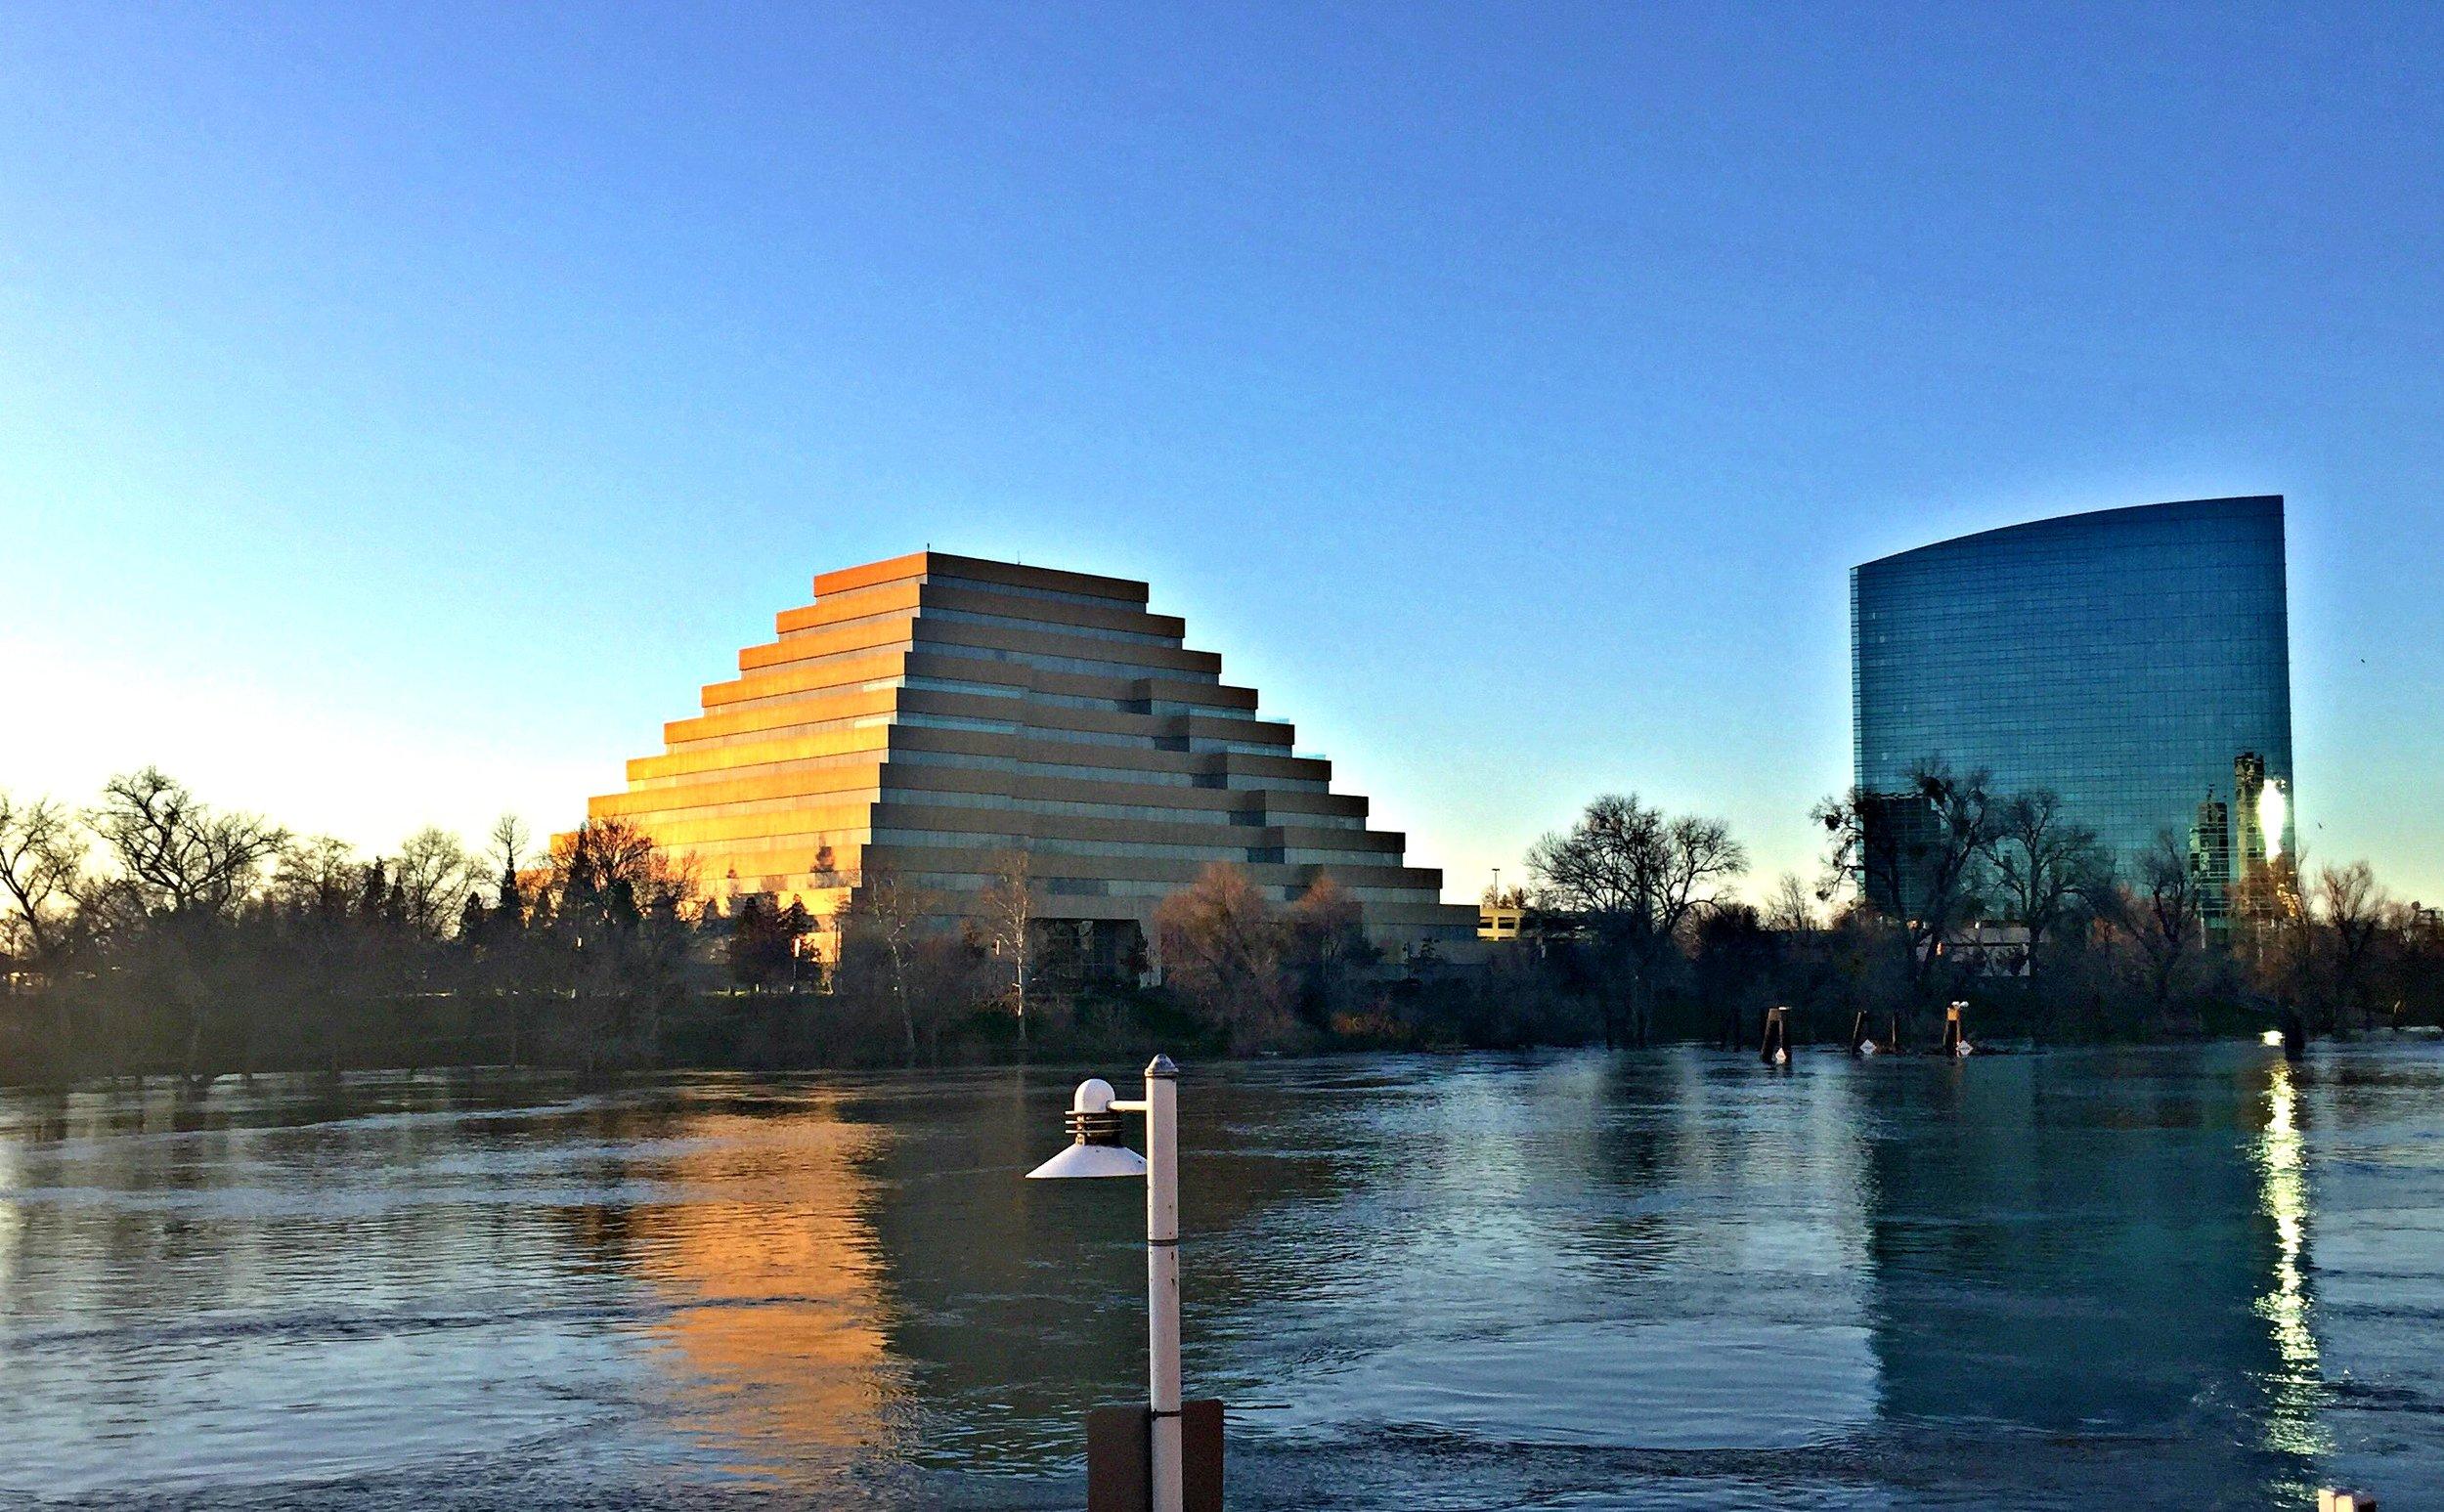 Ziggurat Building, West Sacramento